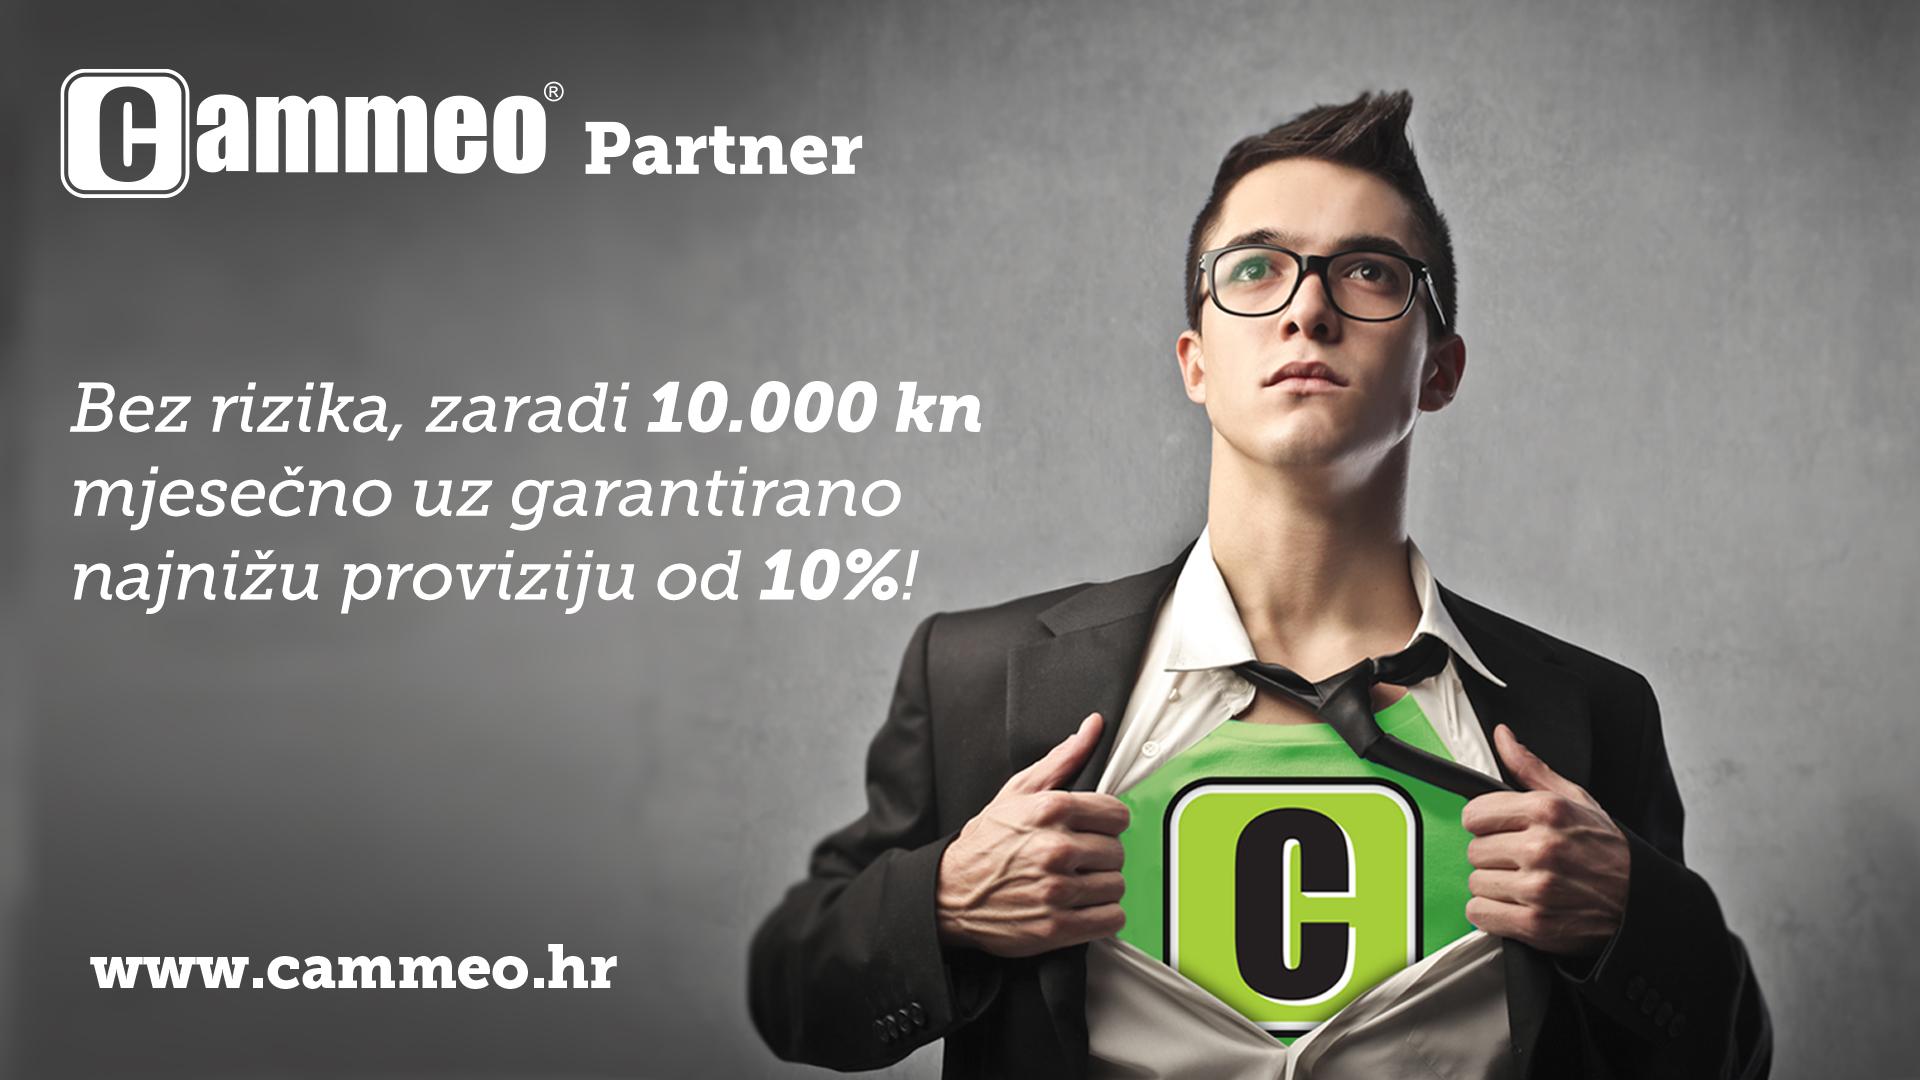 PR - Cammeo Partner 1920 x 1080 px